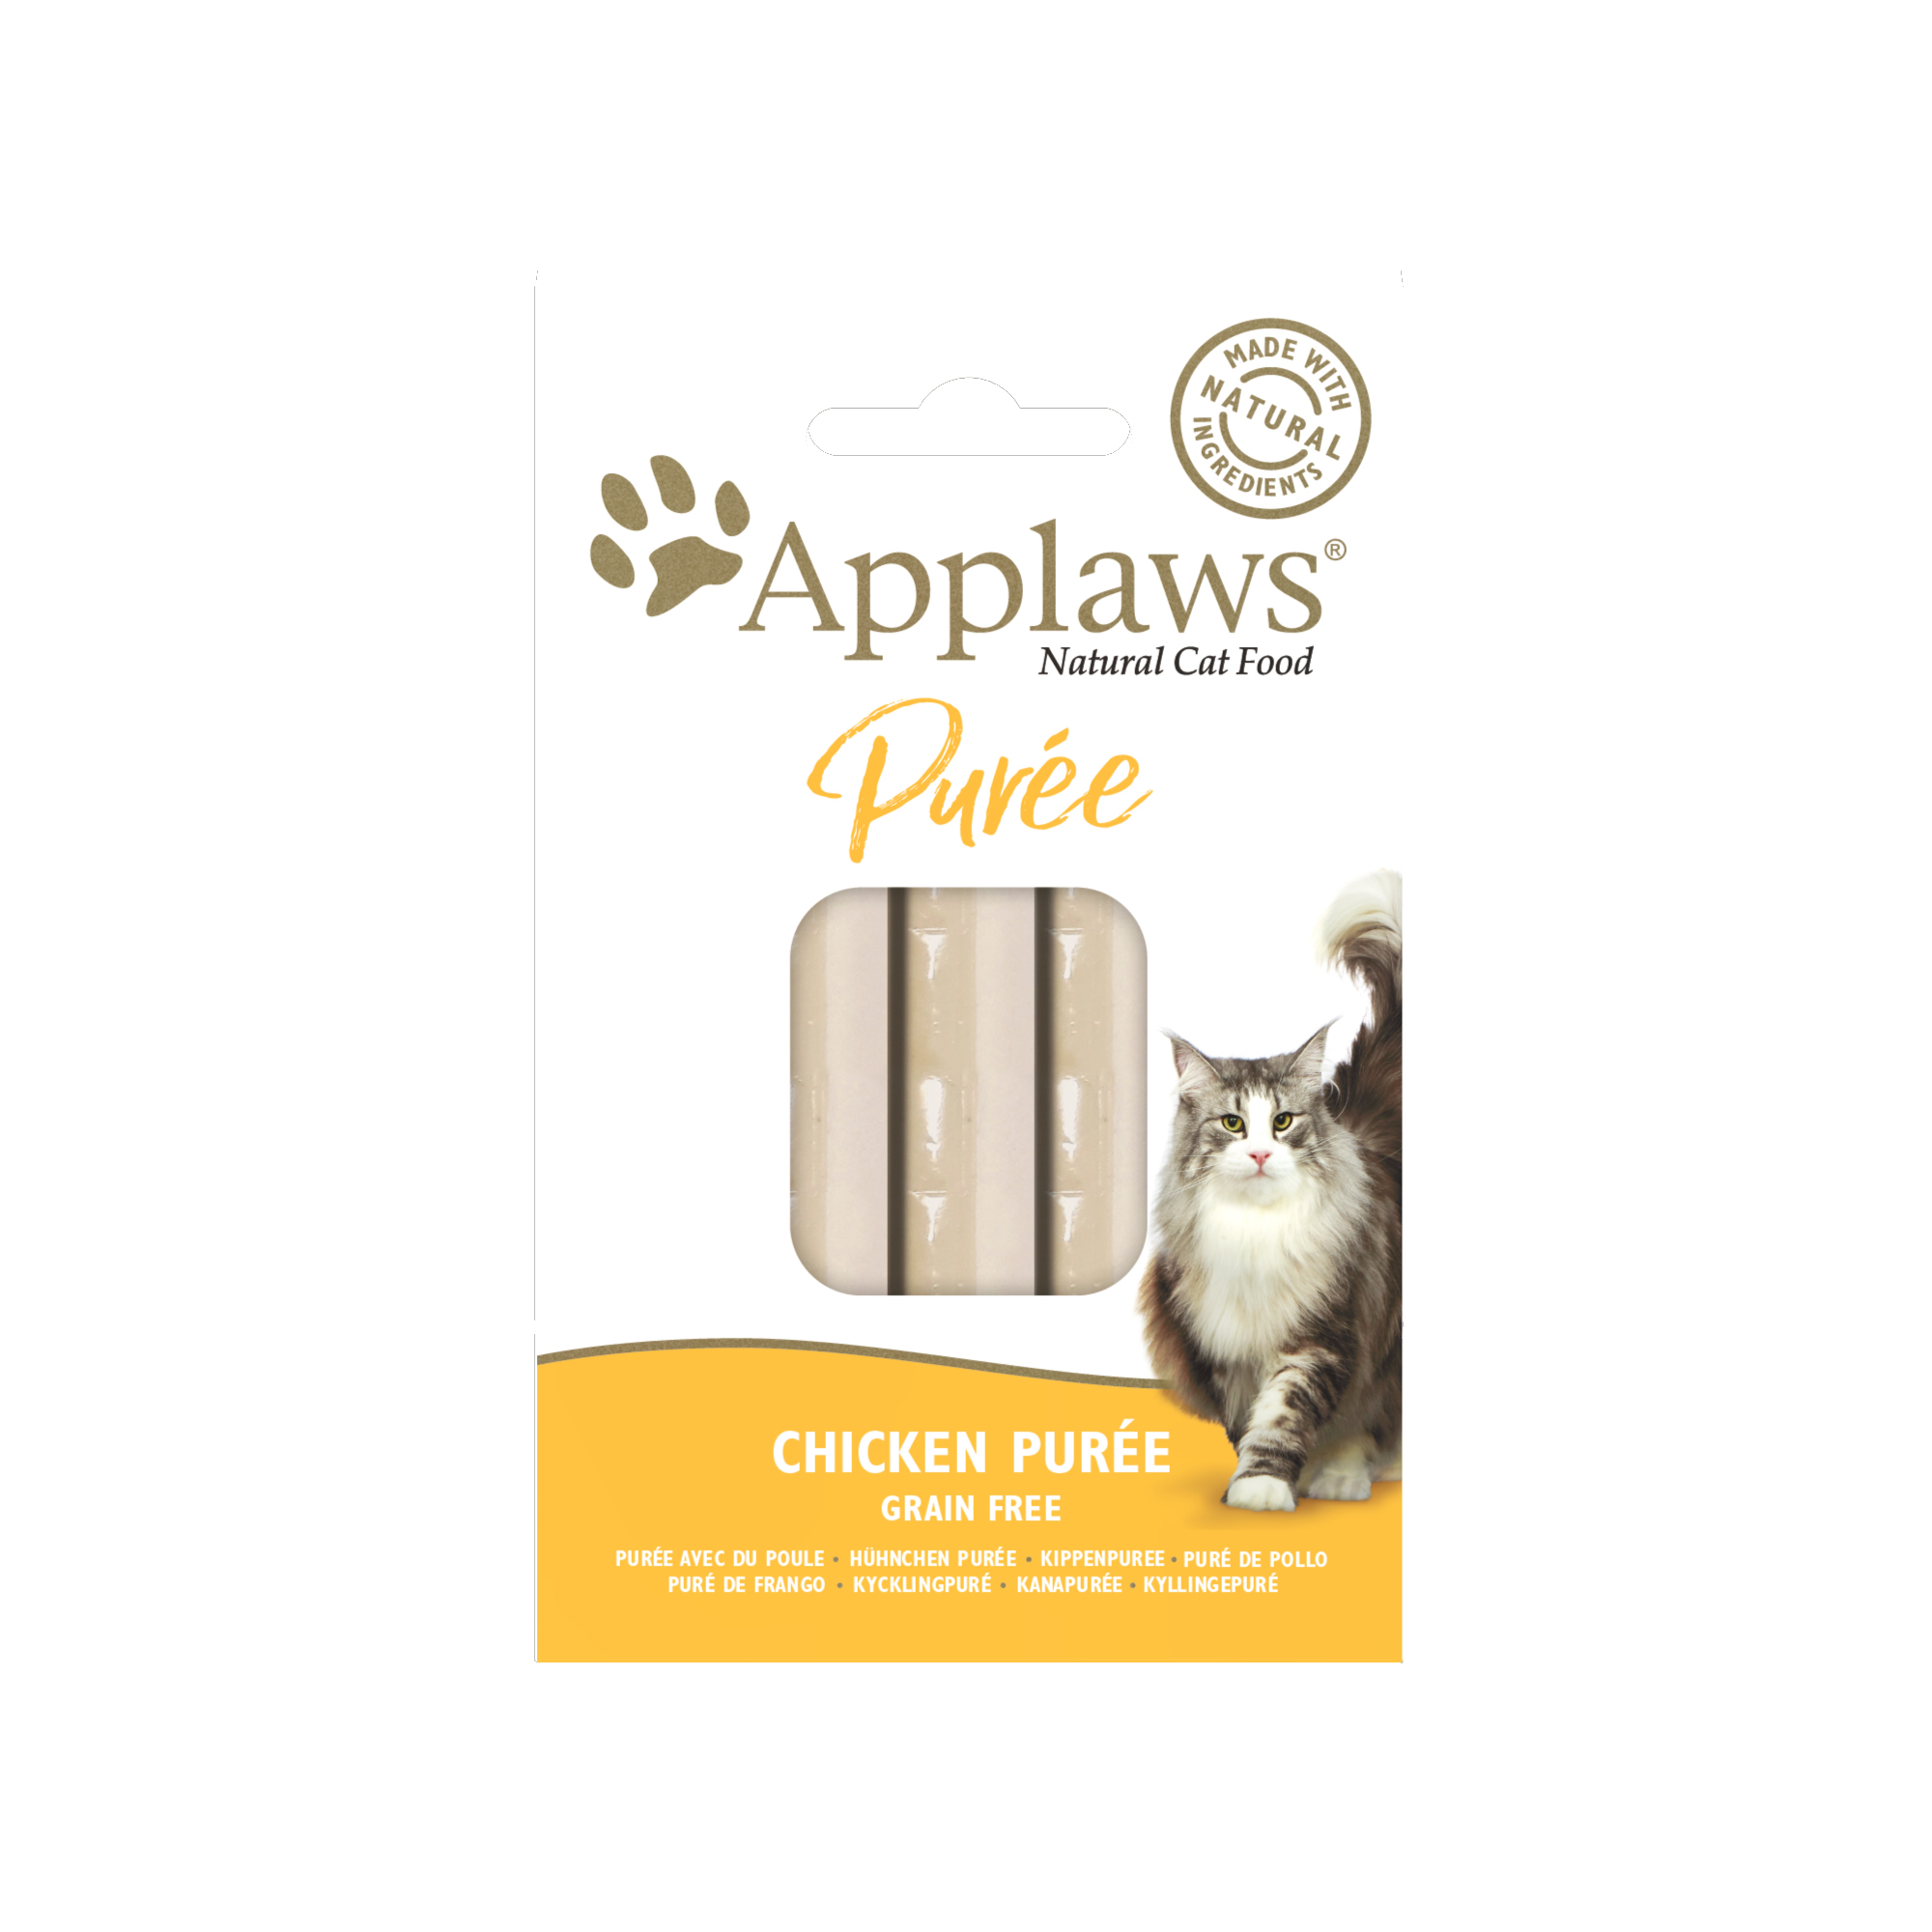 Applaws Katt Kycklingpuré